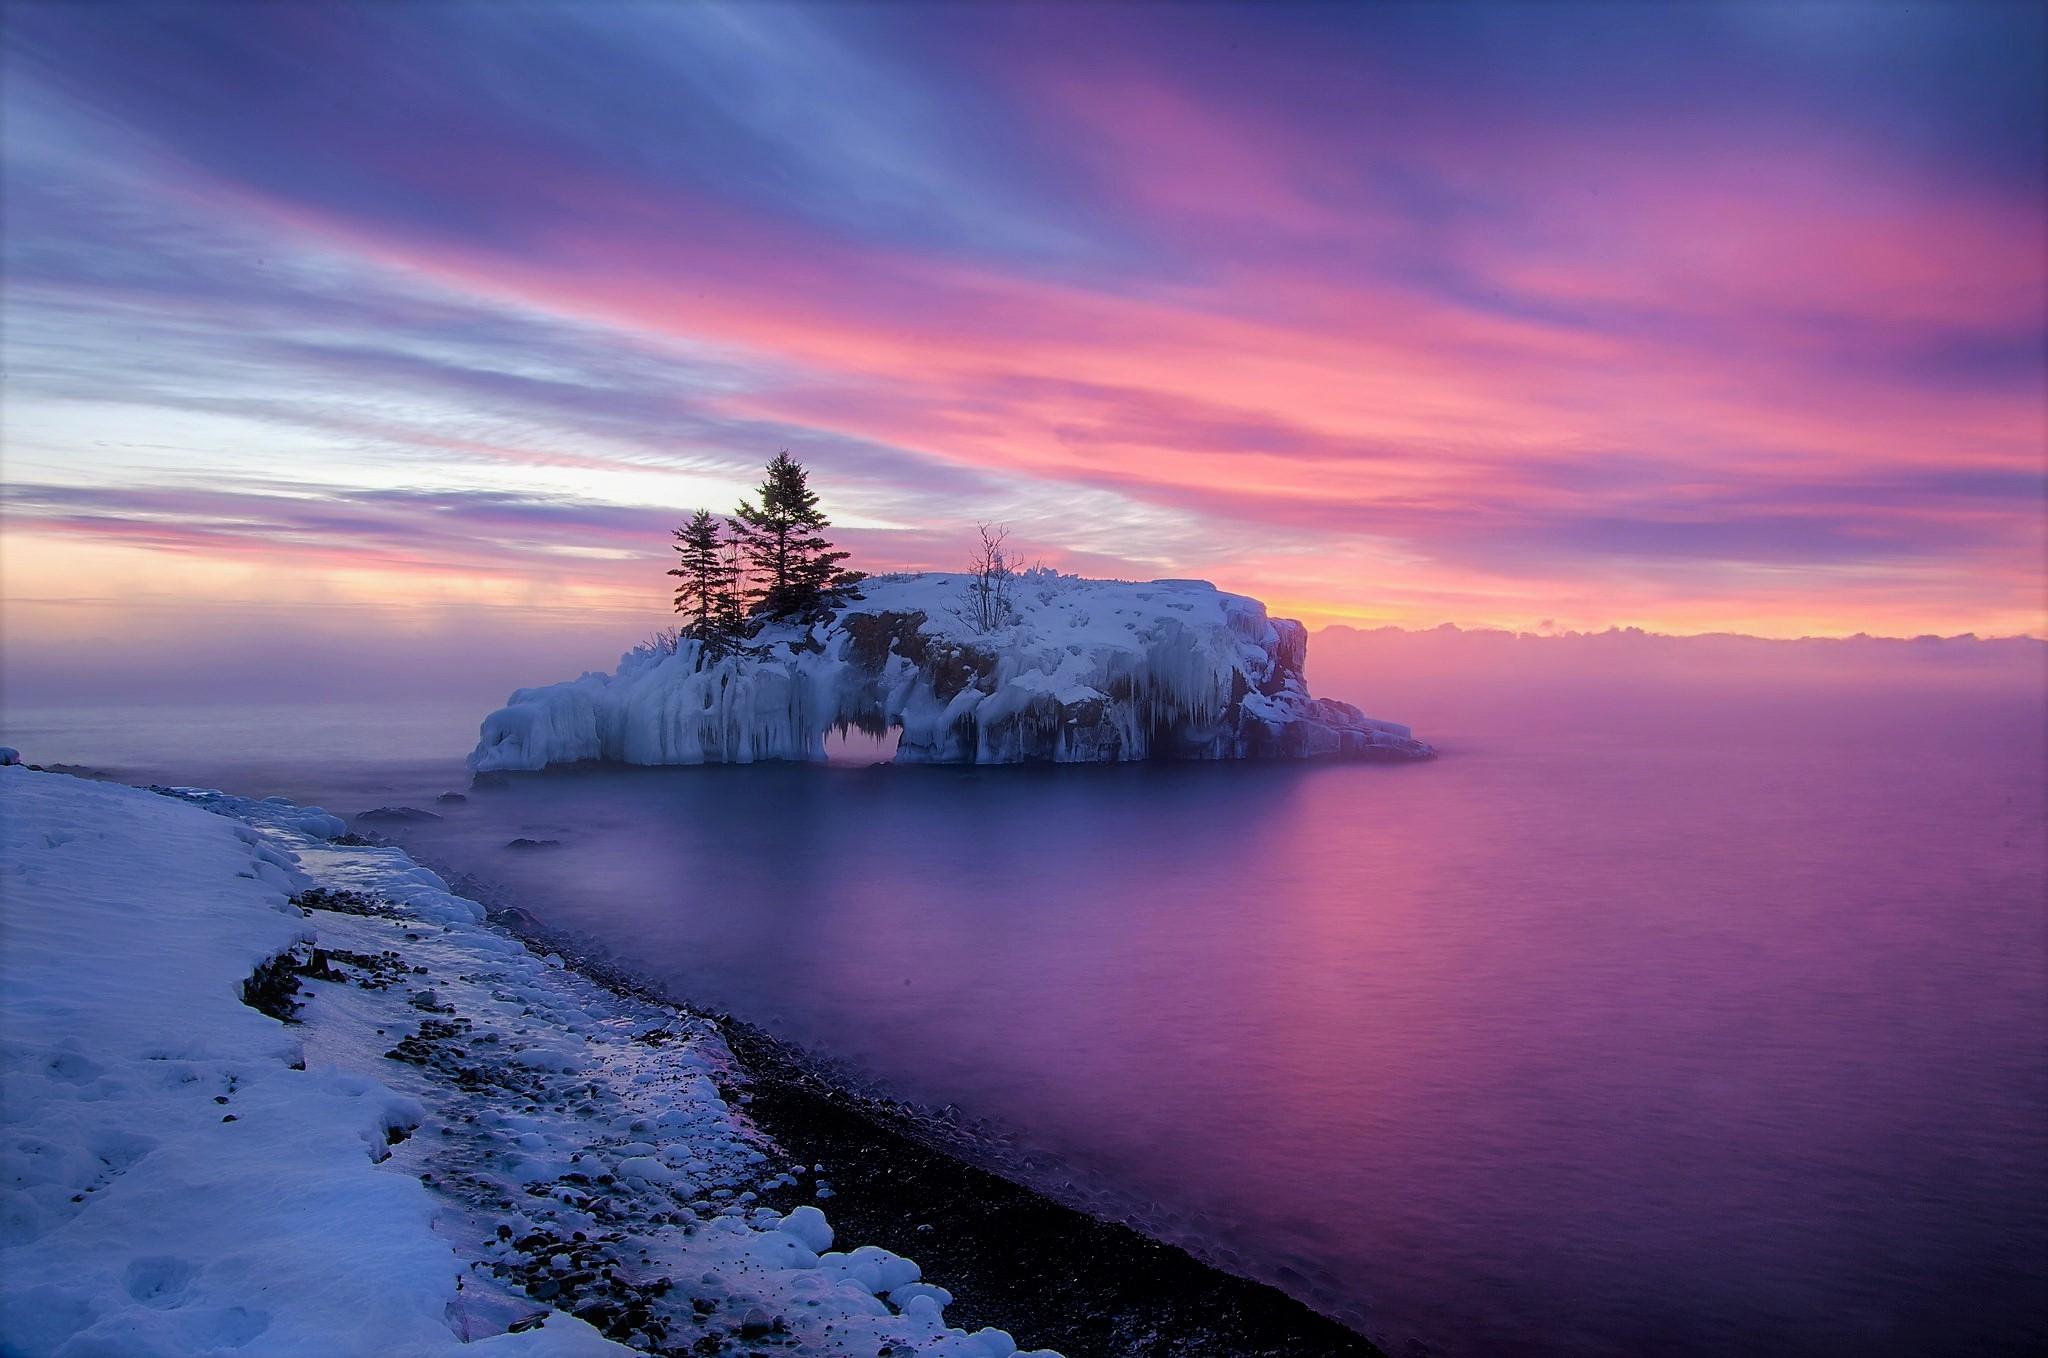 Winter Ocean Sea Island Tree Frozen Snow 2048x1358